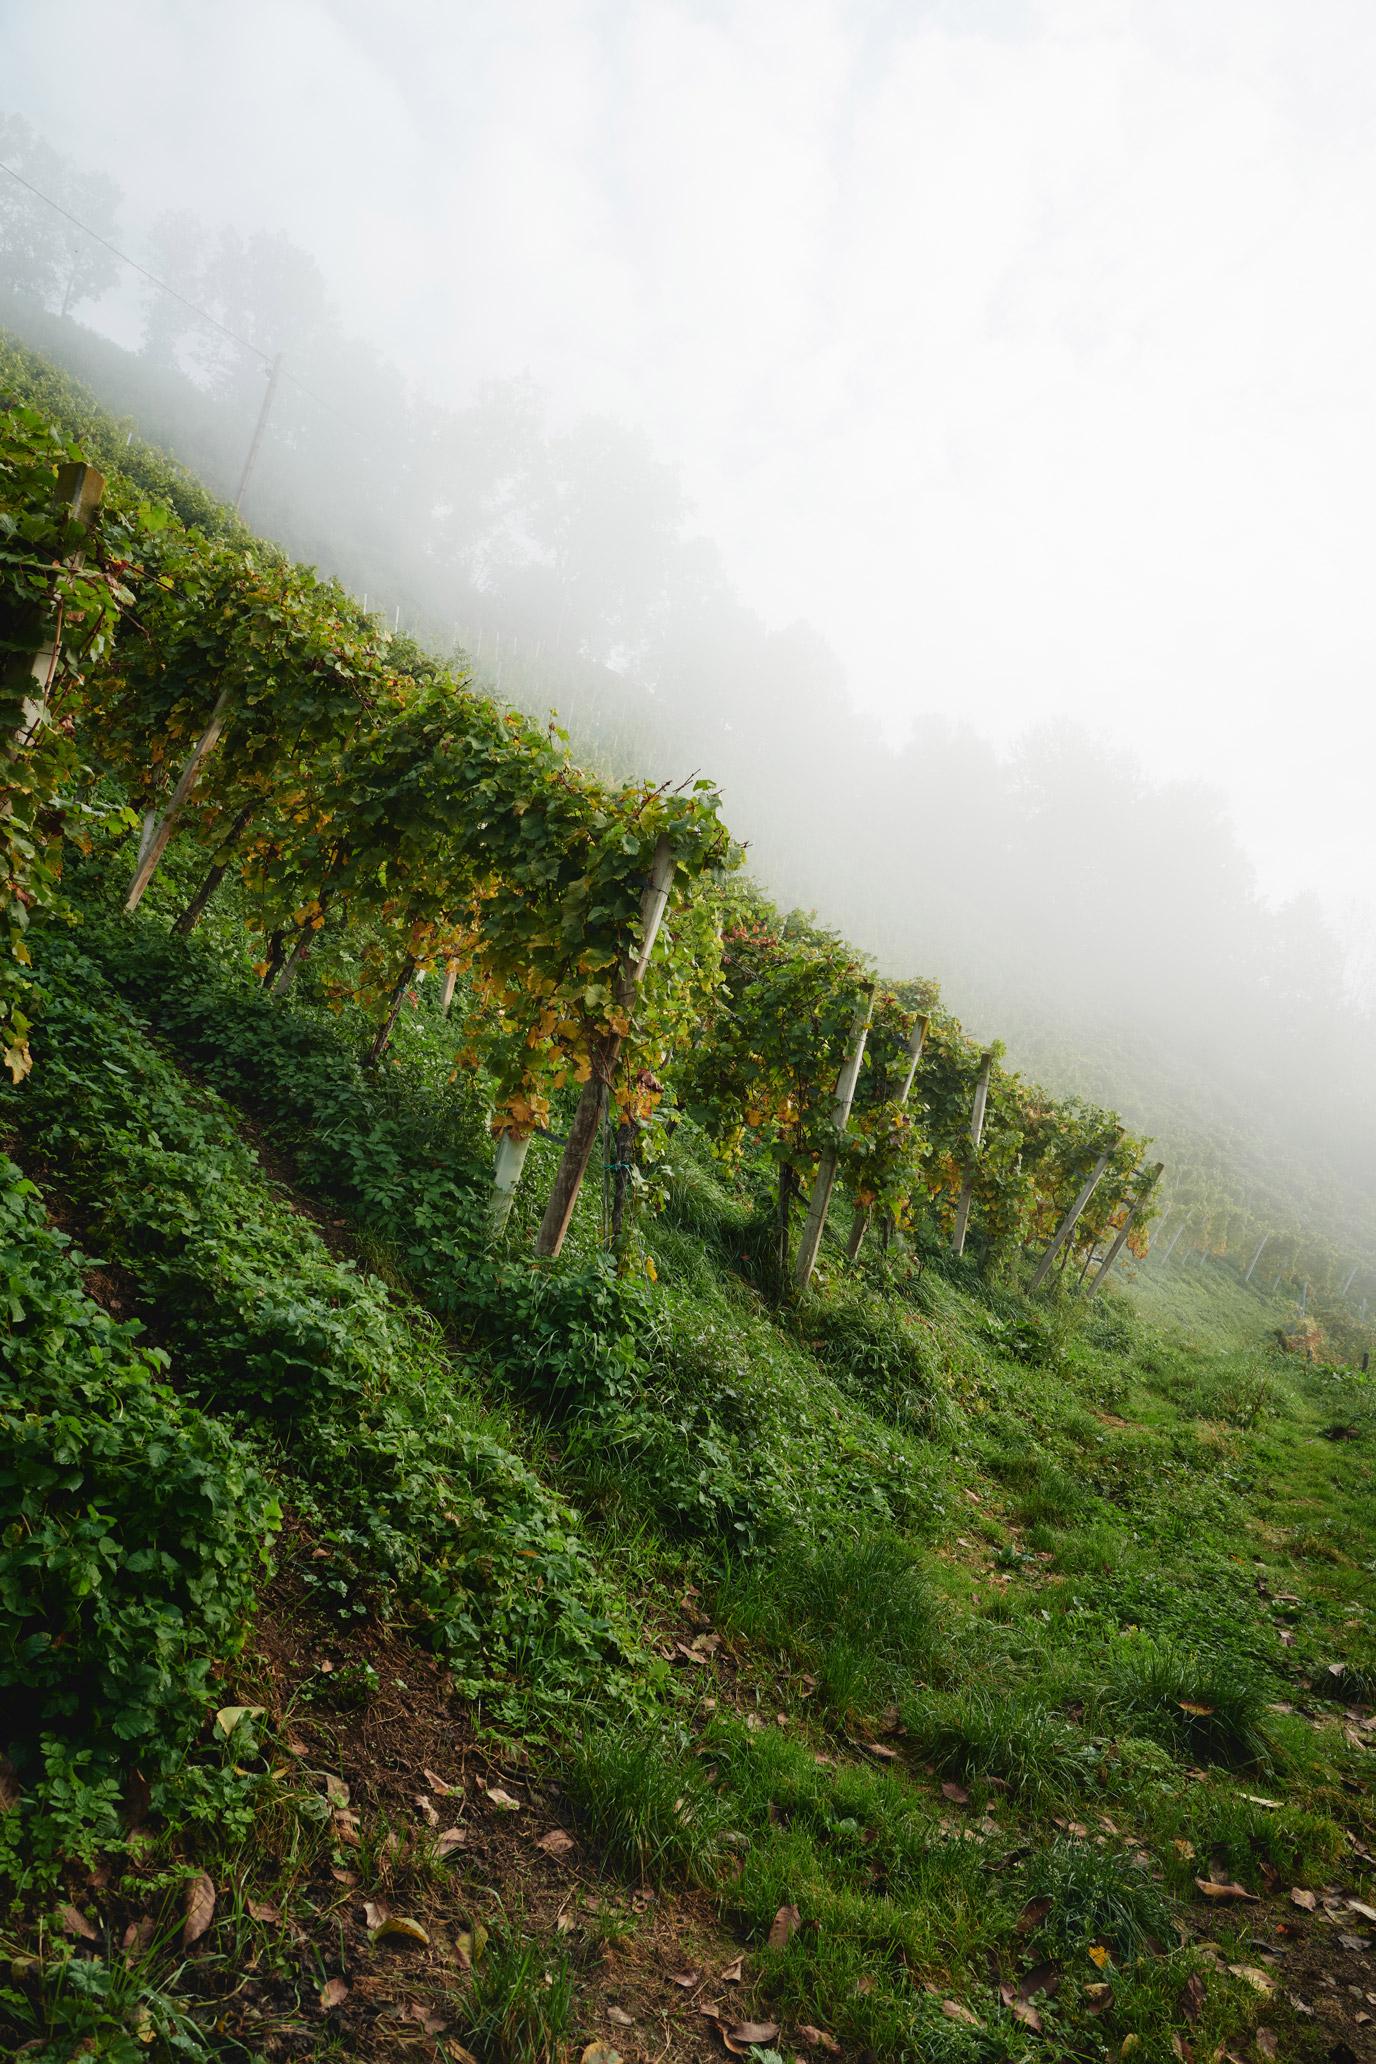 stk-wein-wohlmuth-wine-steep-hill-fog